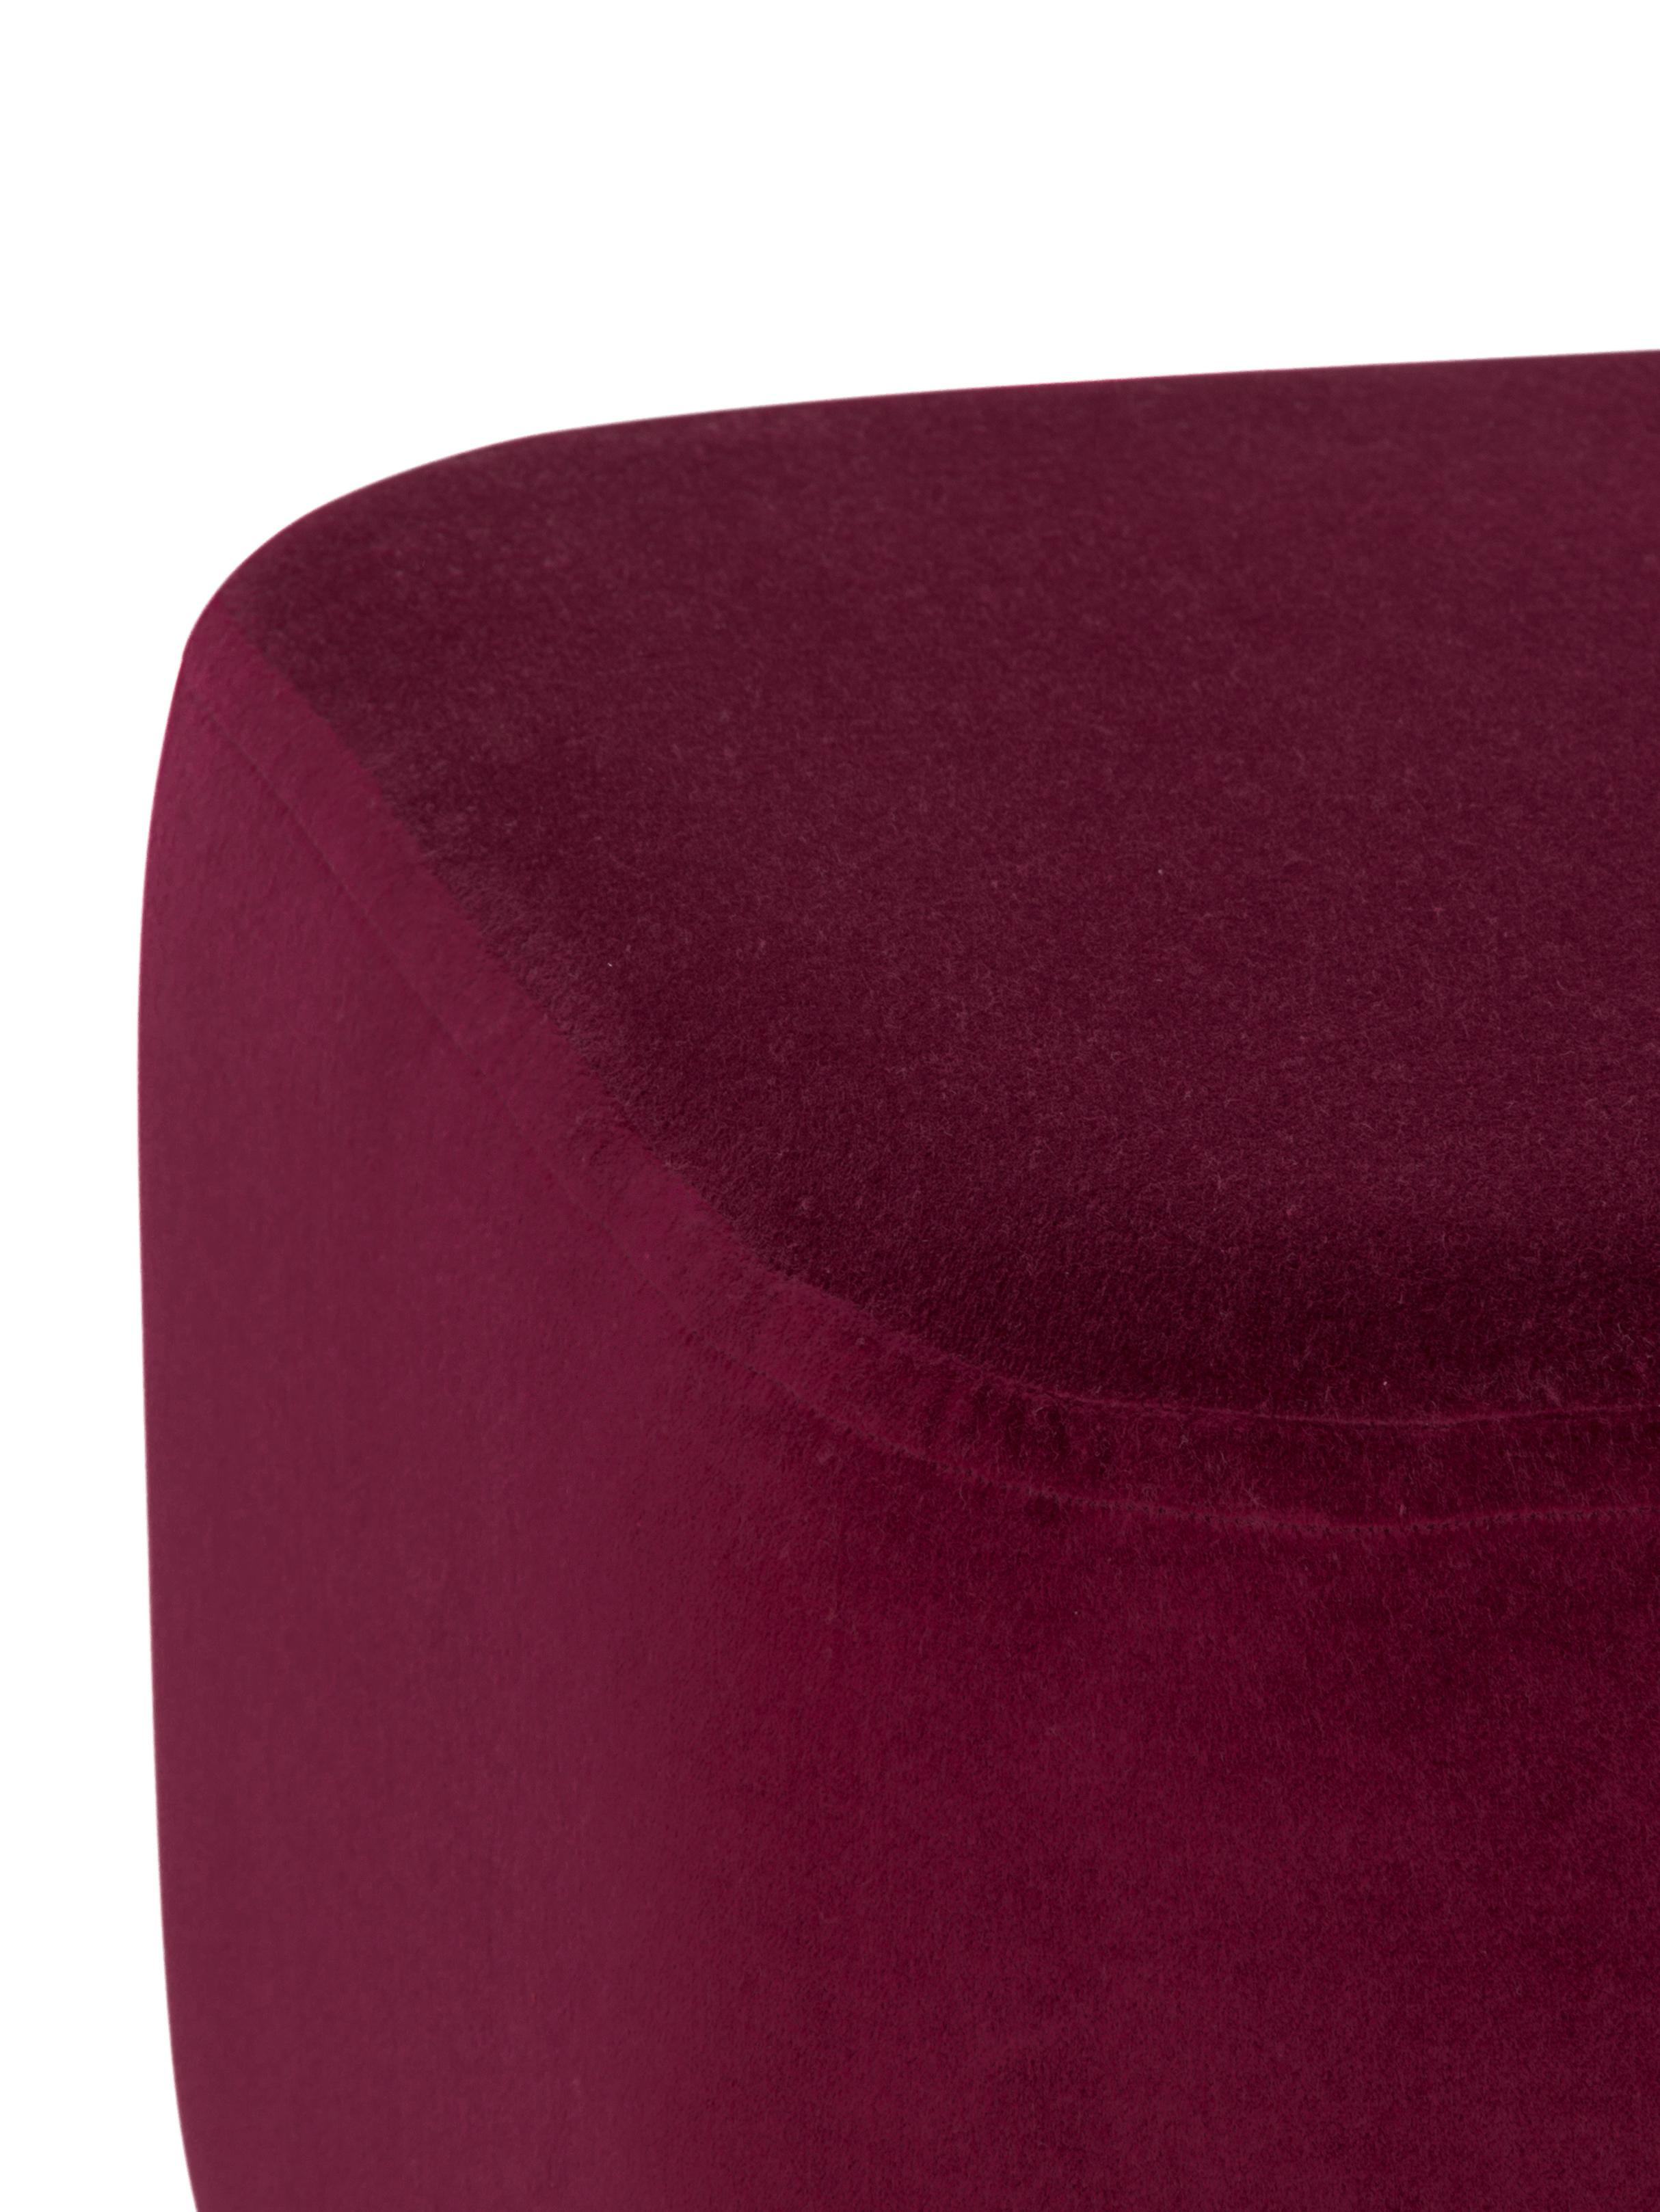 Samt-Hocker Harper, Bezug: Baumwollsamt, Fuß: Metall, pulverbeschichtet, Dunkelrot, Goldfarben, 46 x 44 cm